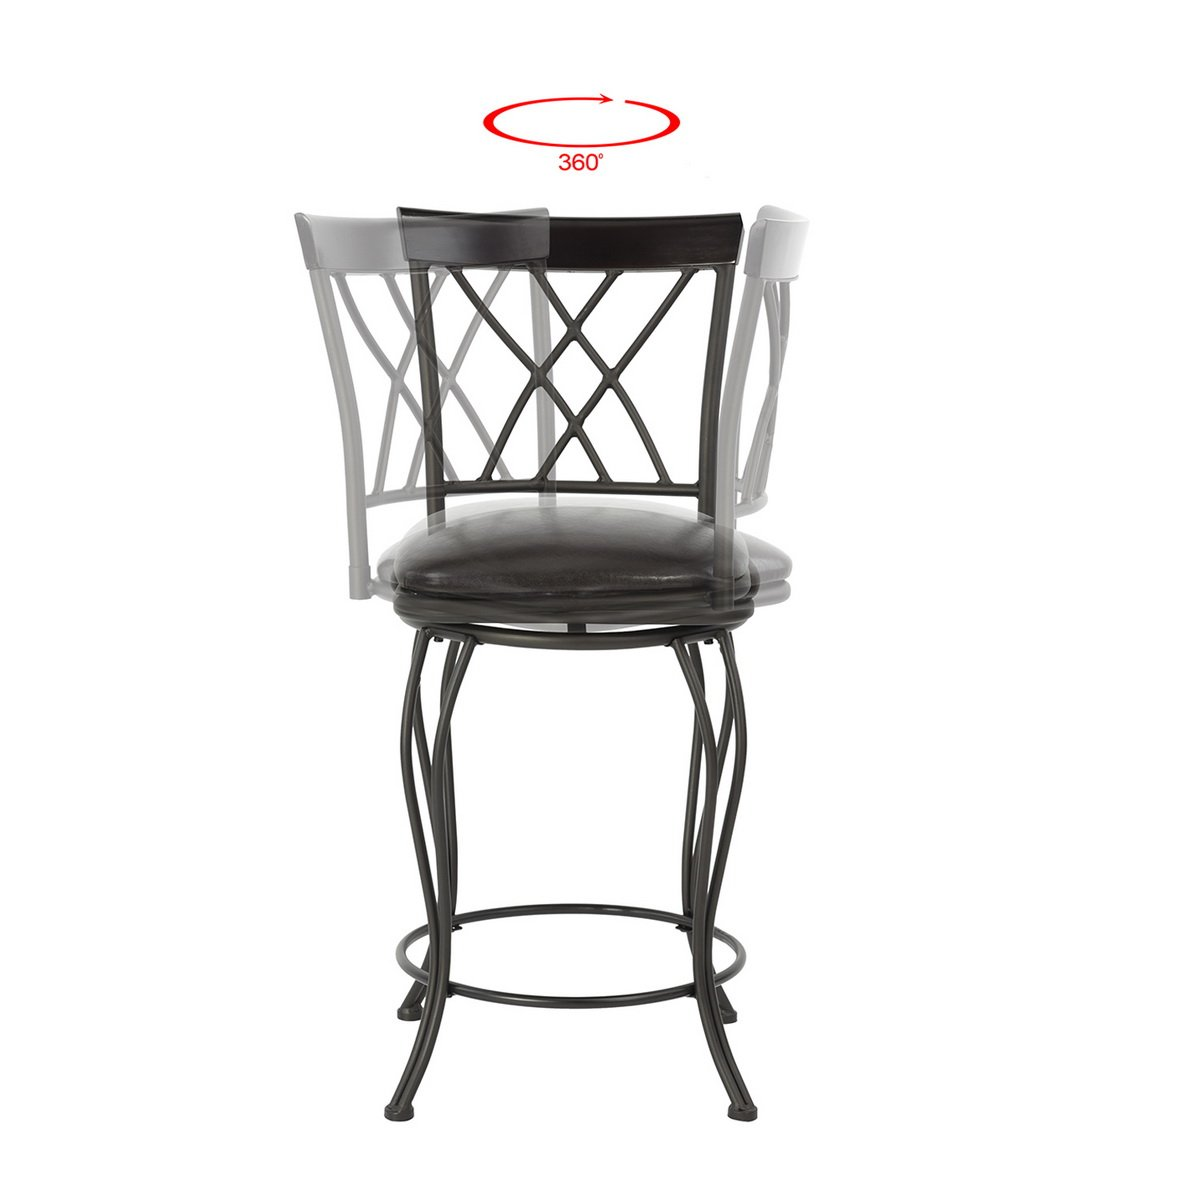 FurnitureR 24'' Circles-Back Swivel Bar stool Counter Height Bar Chair by FurnitureR (Image #4)